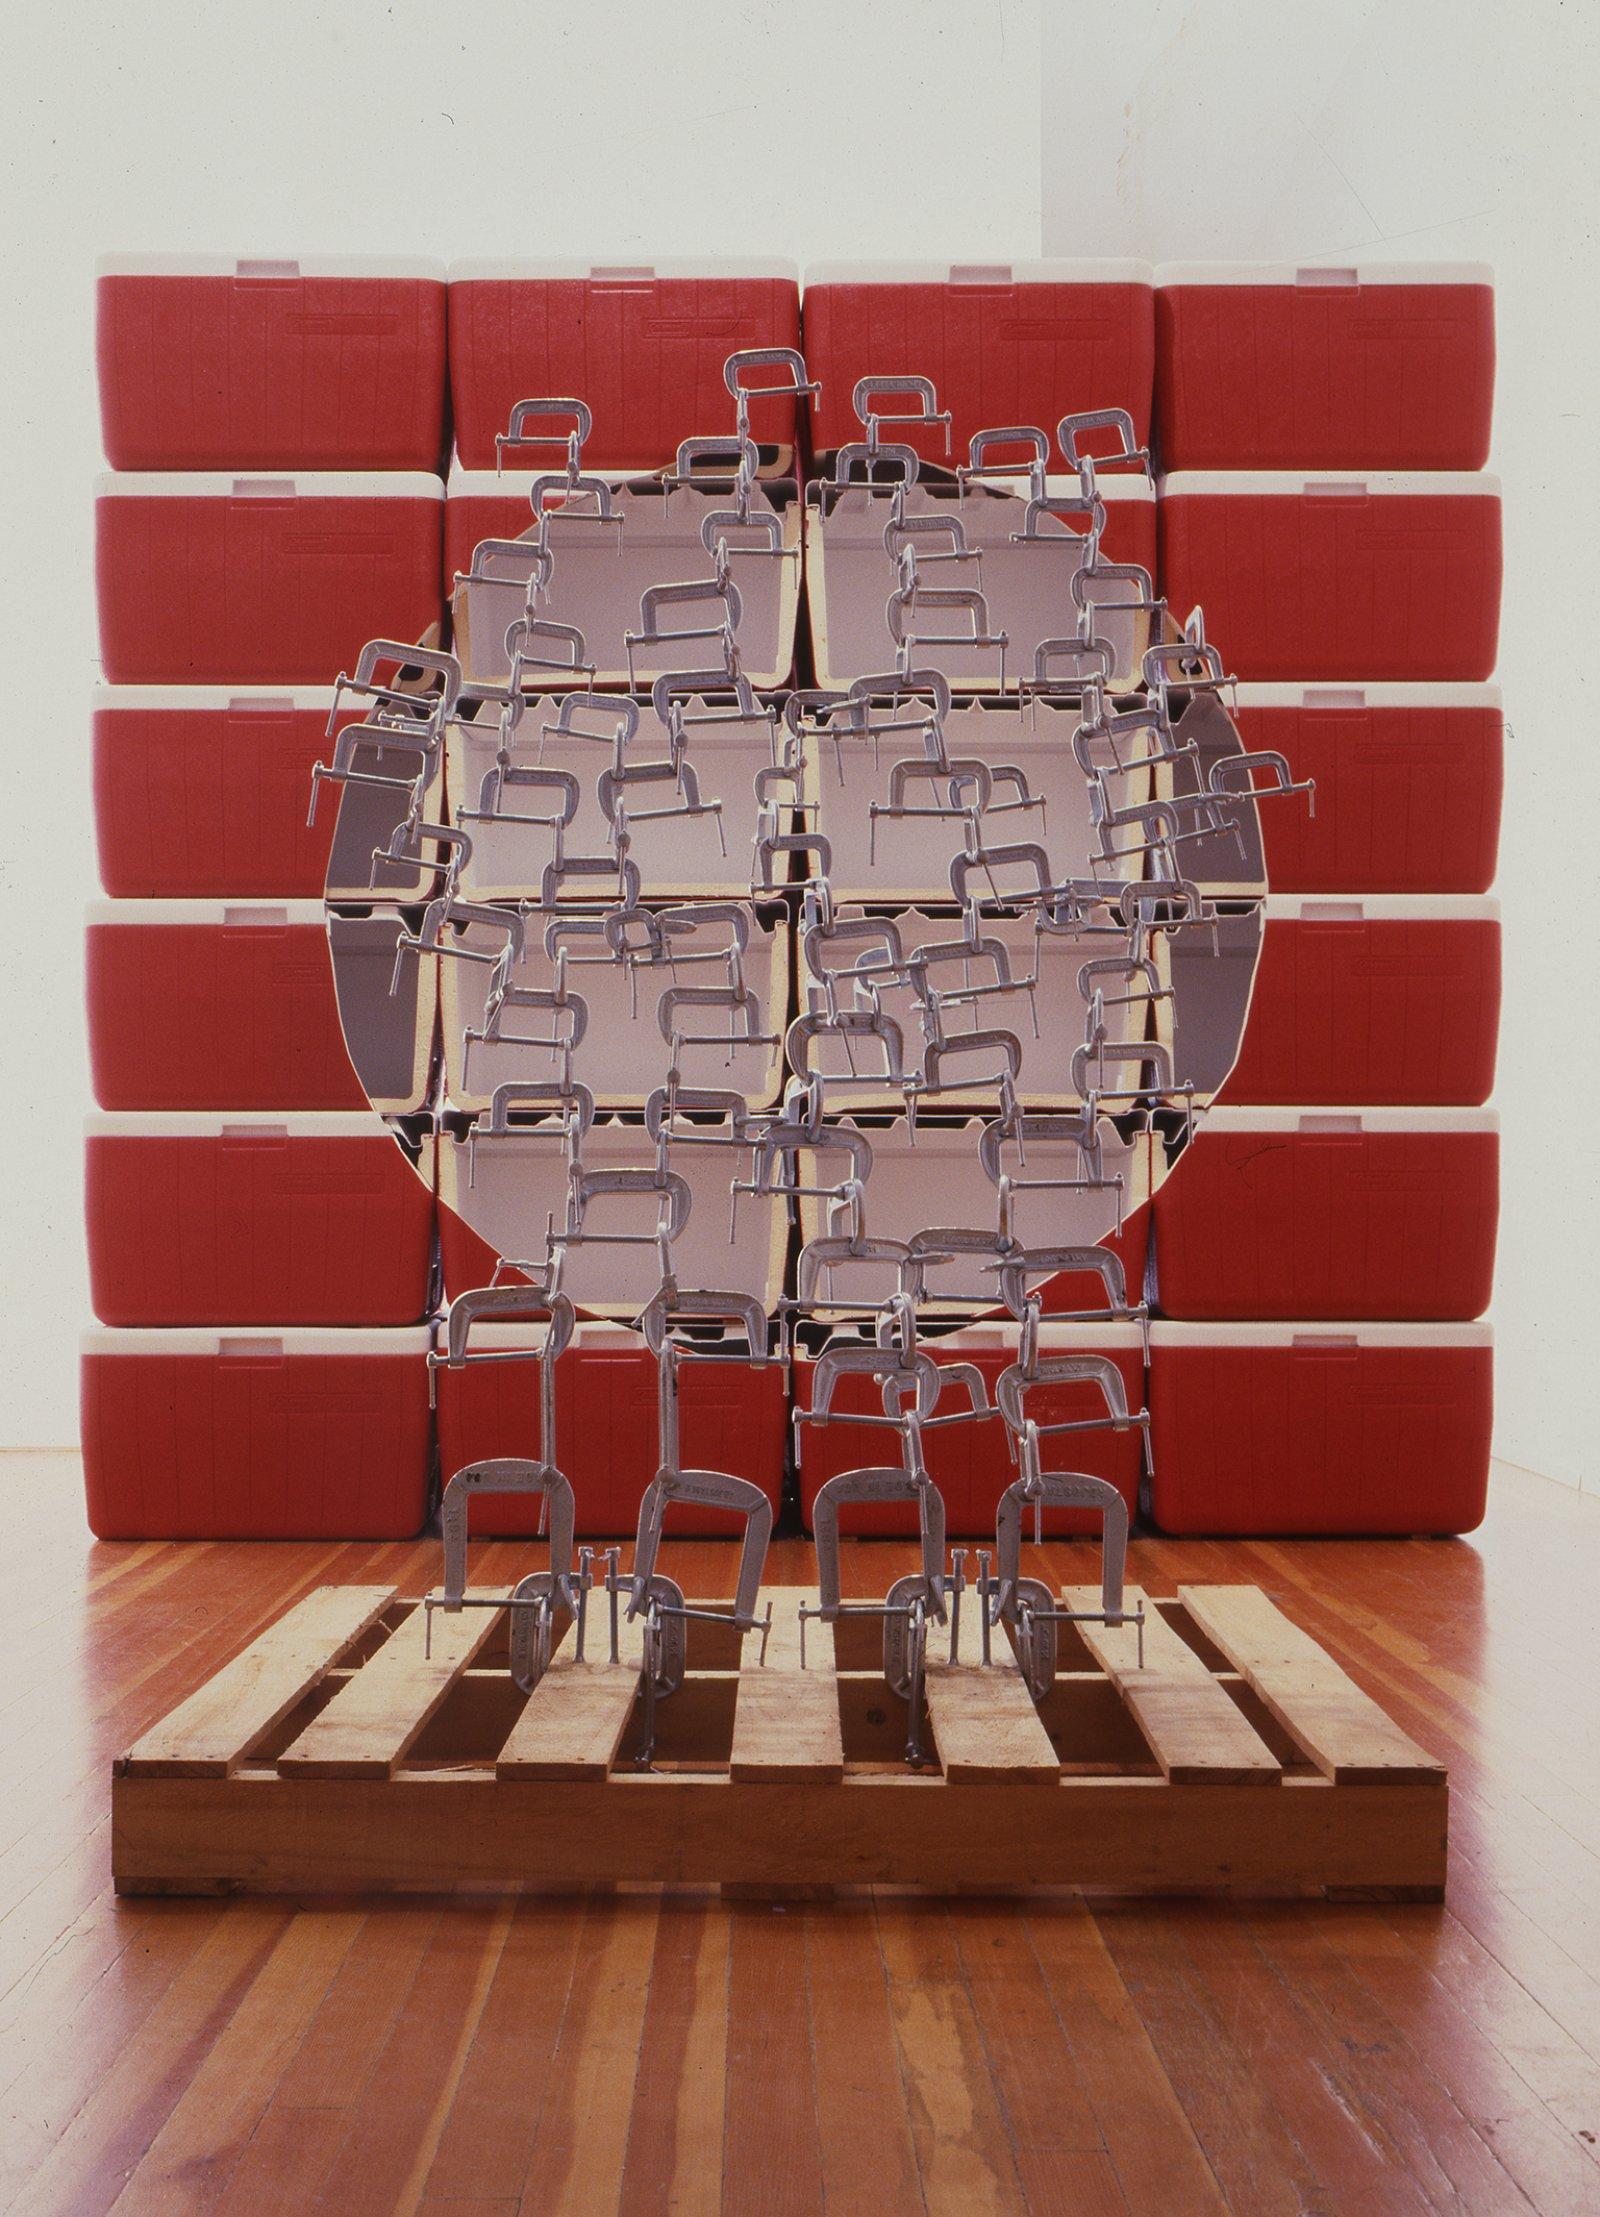 Brian Jungen,Void, 2002, coleman coolers, wooden palette, metal clamps, light, 87 x 96 x 27 in. (221 x 244 x 69 cm)